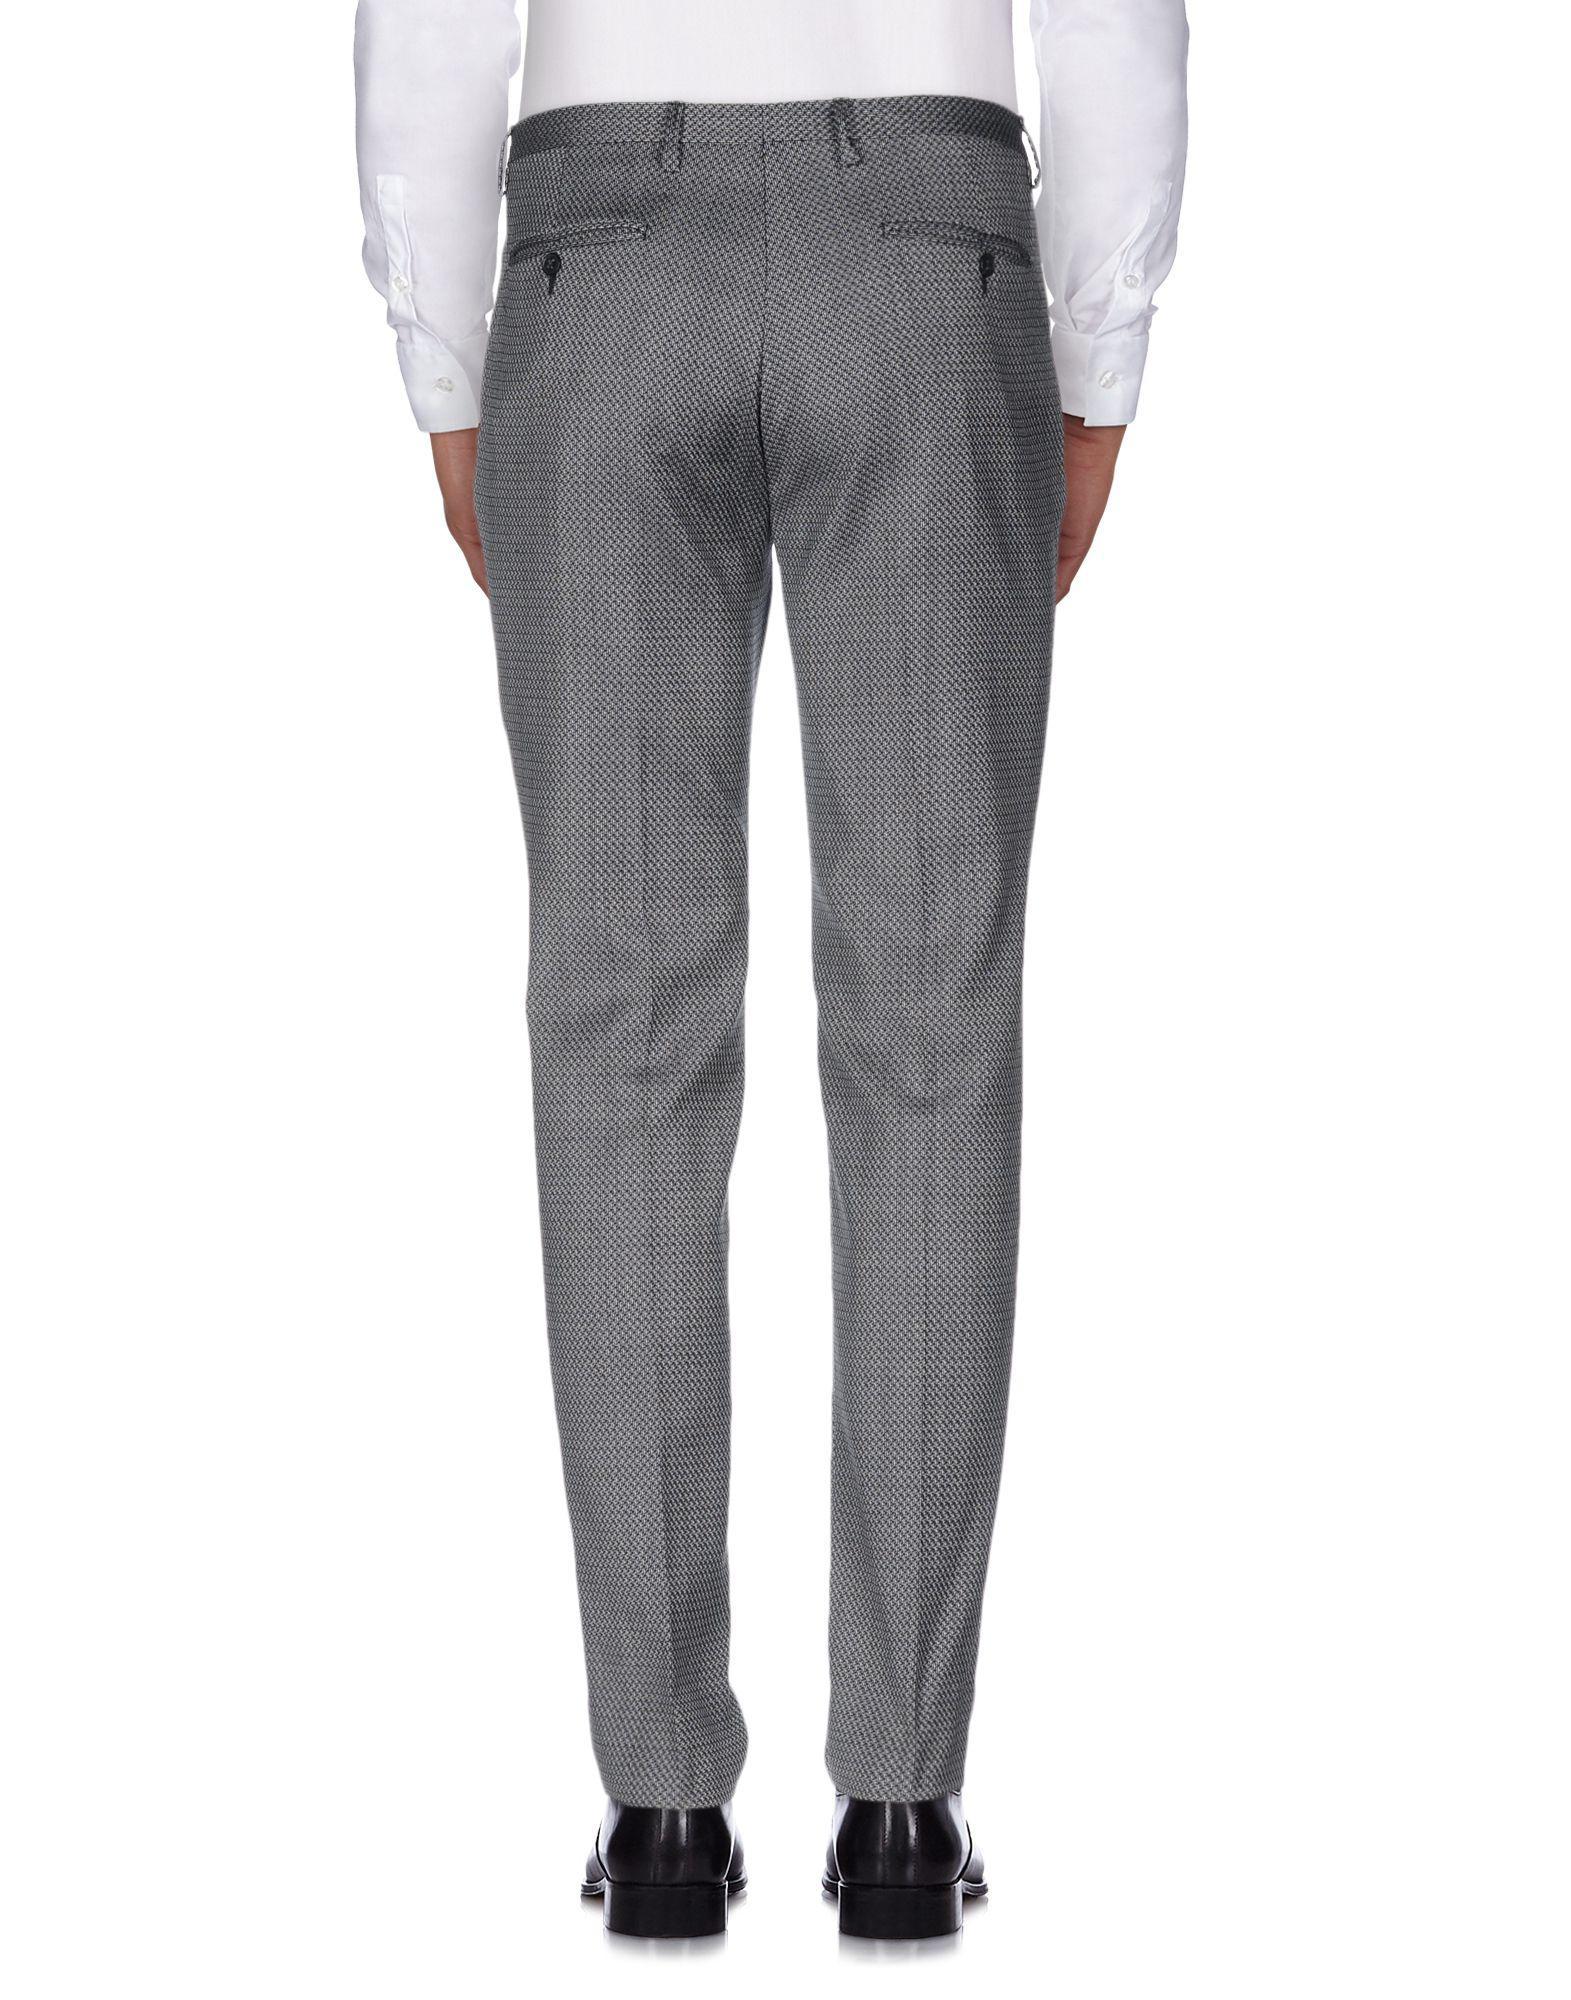 Brian Dales Wool Casual Trouser in Black (Grey) for Men